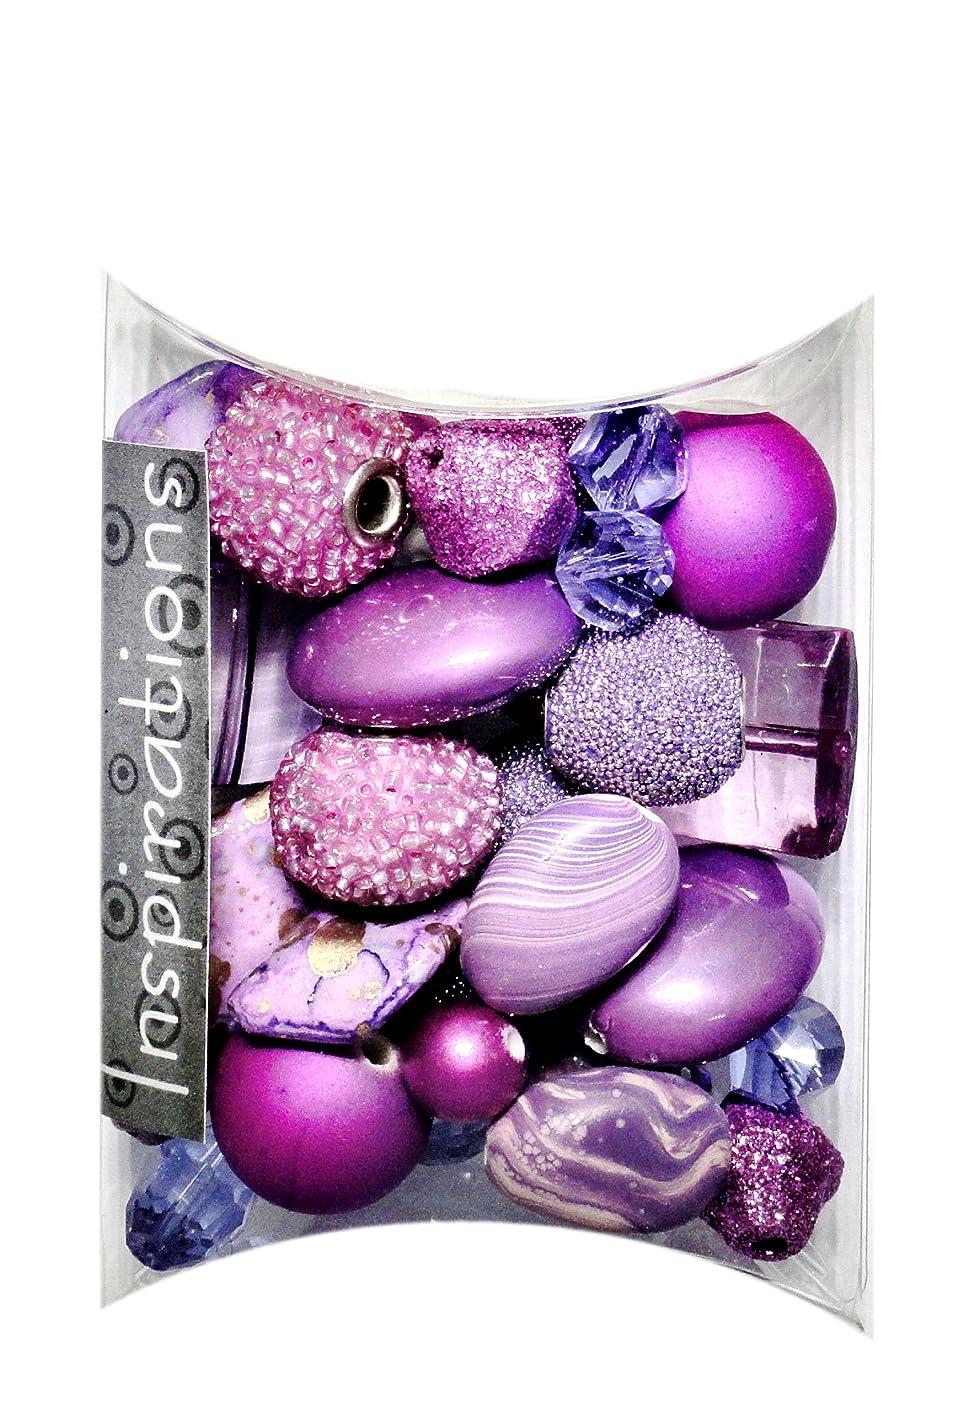 Jesse James Beads 5747 Inspirations Royal Charm Bead